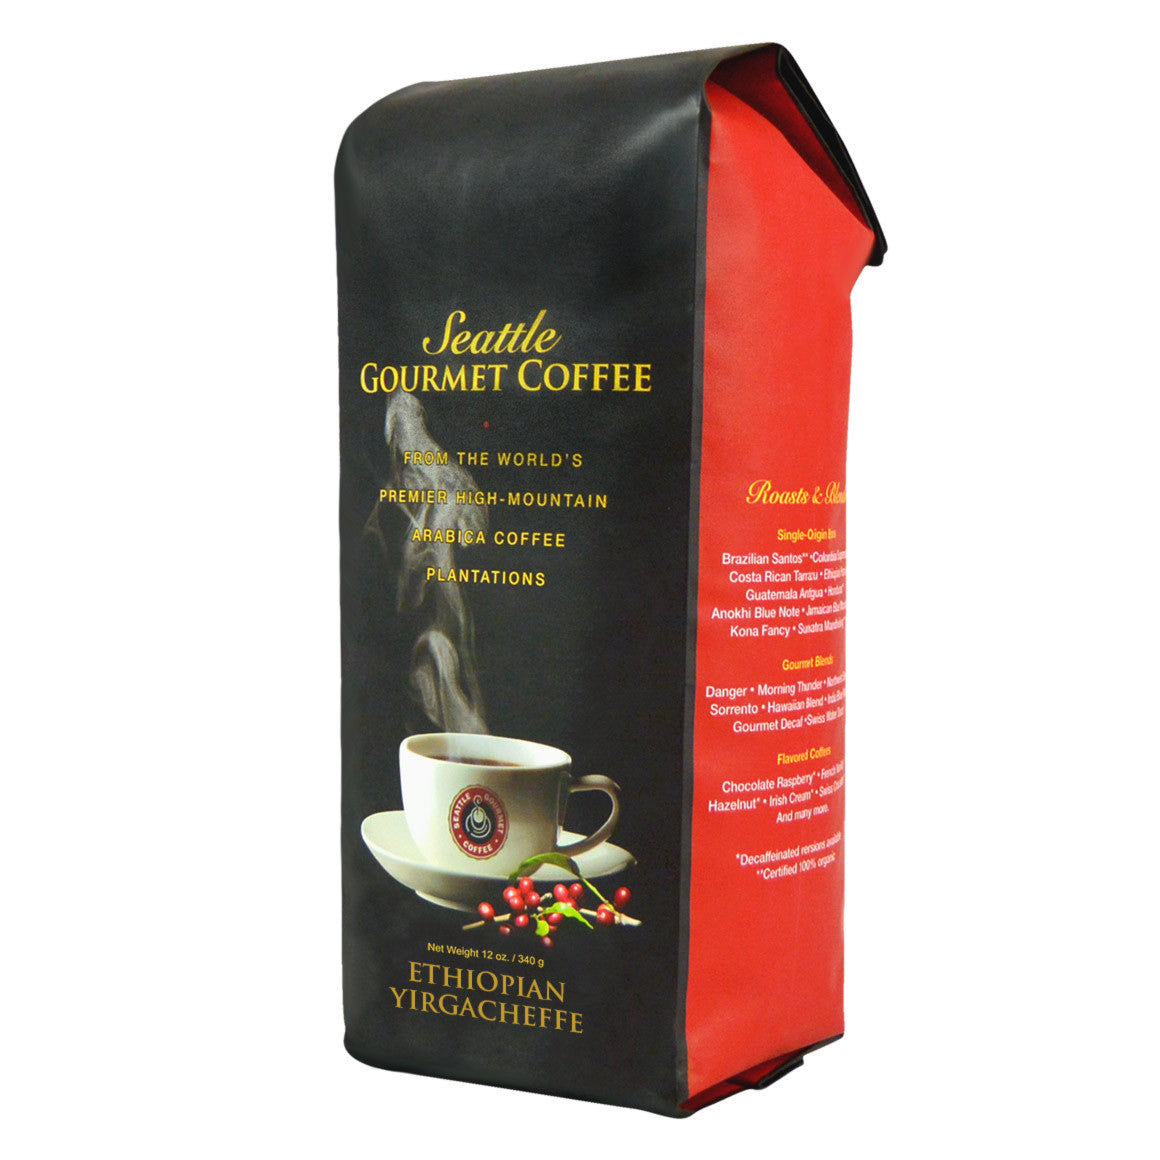 Ethiopian Yirgacheffe (Medium Roast) - Seattle Gourmet Coffee